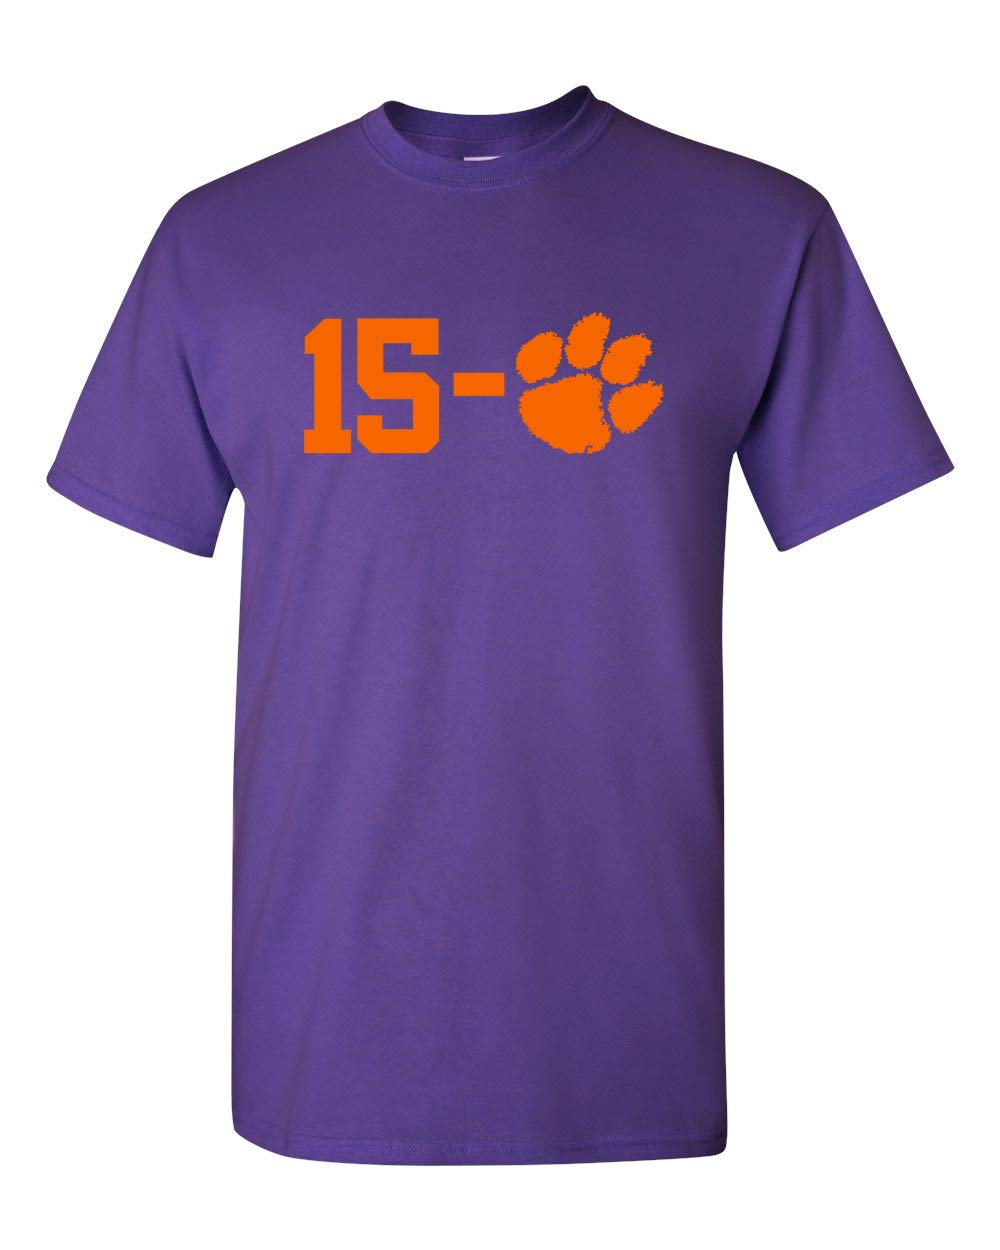 Clemson 15 0 National Champions Heavy T Shirt Shirt Purple W Orange 6573